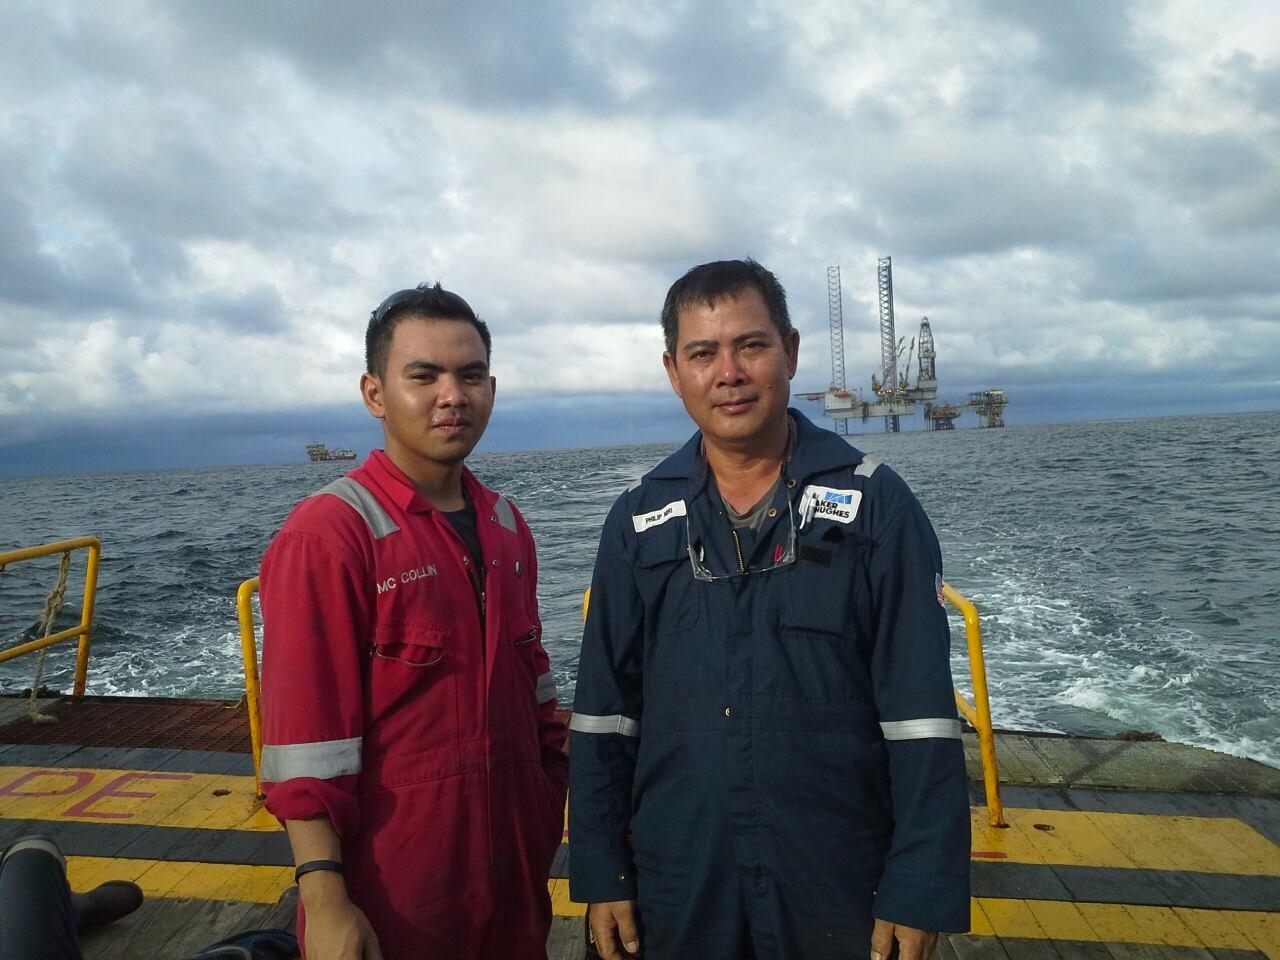 Sarawak, Oil, Prices, Crisis, Documentary, Offshore, Rig, Platform